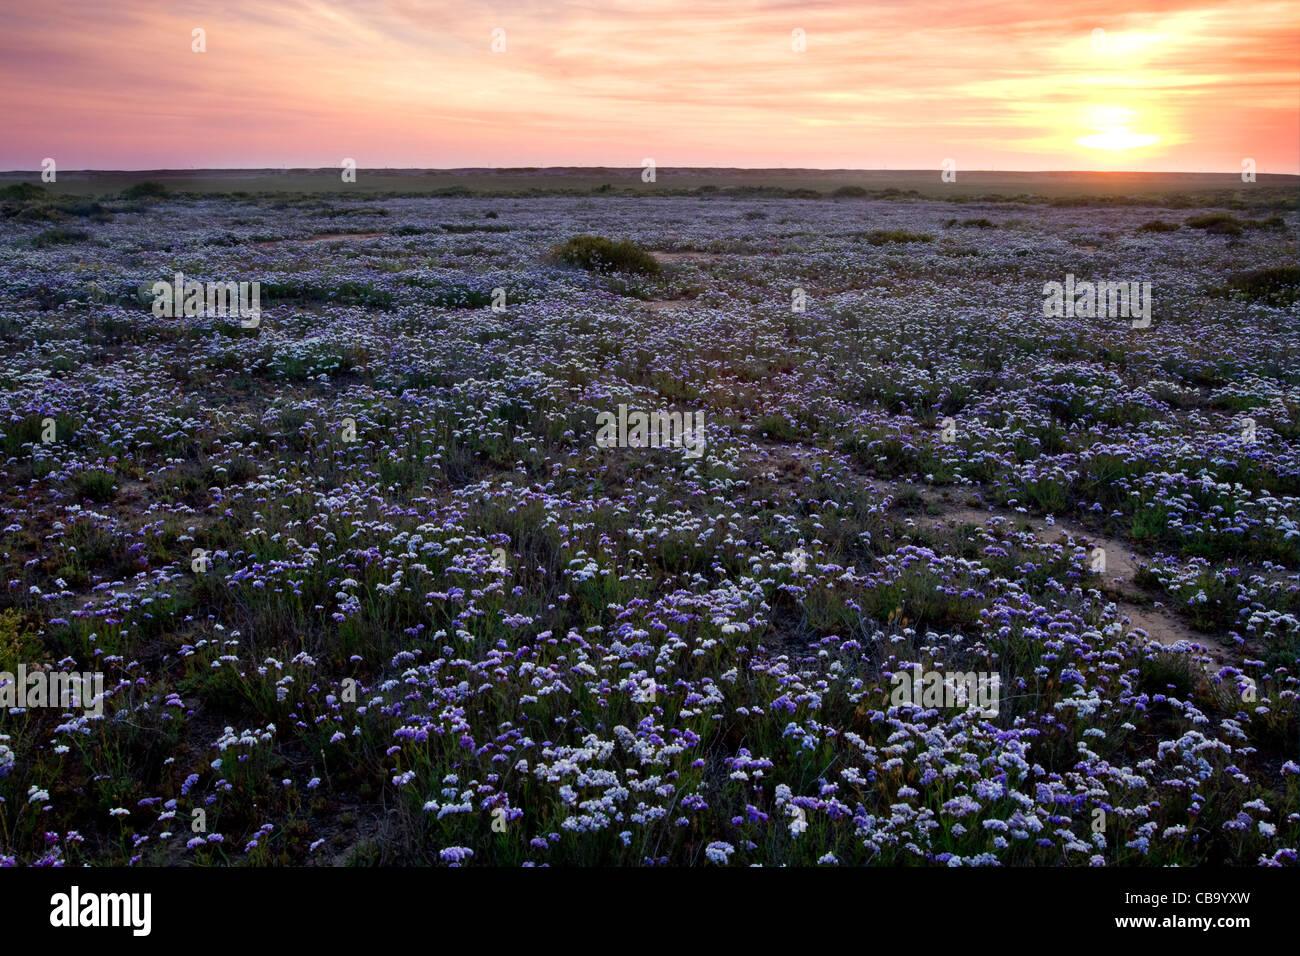 Wildflowers in bloom at sunset near Tijuana, Mexico. Stock Photo